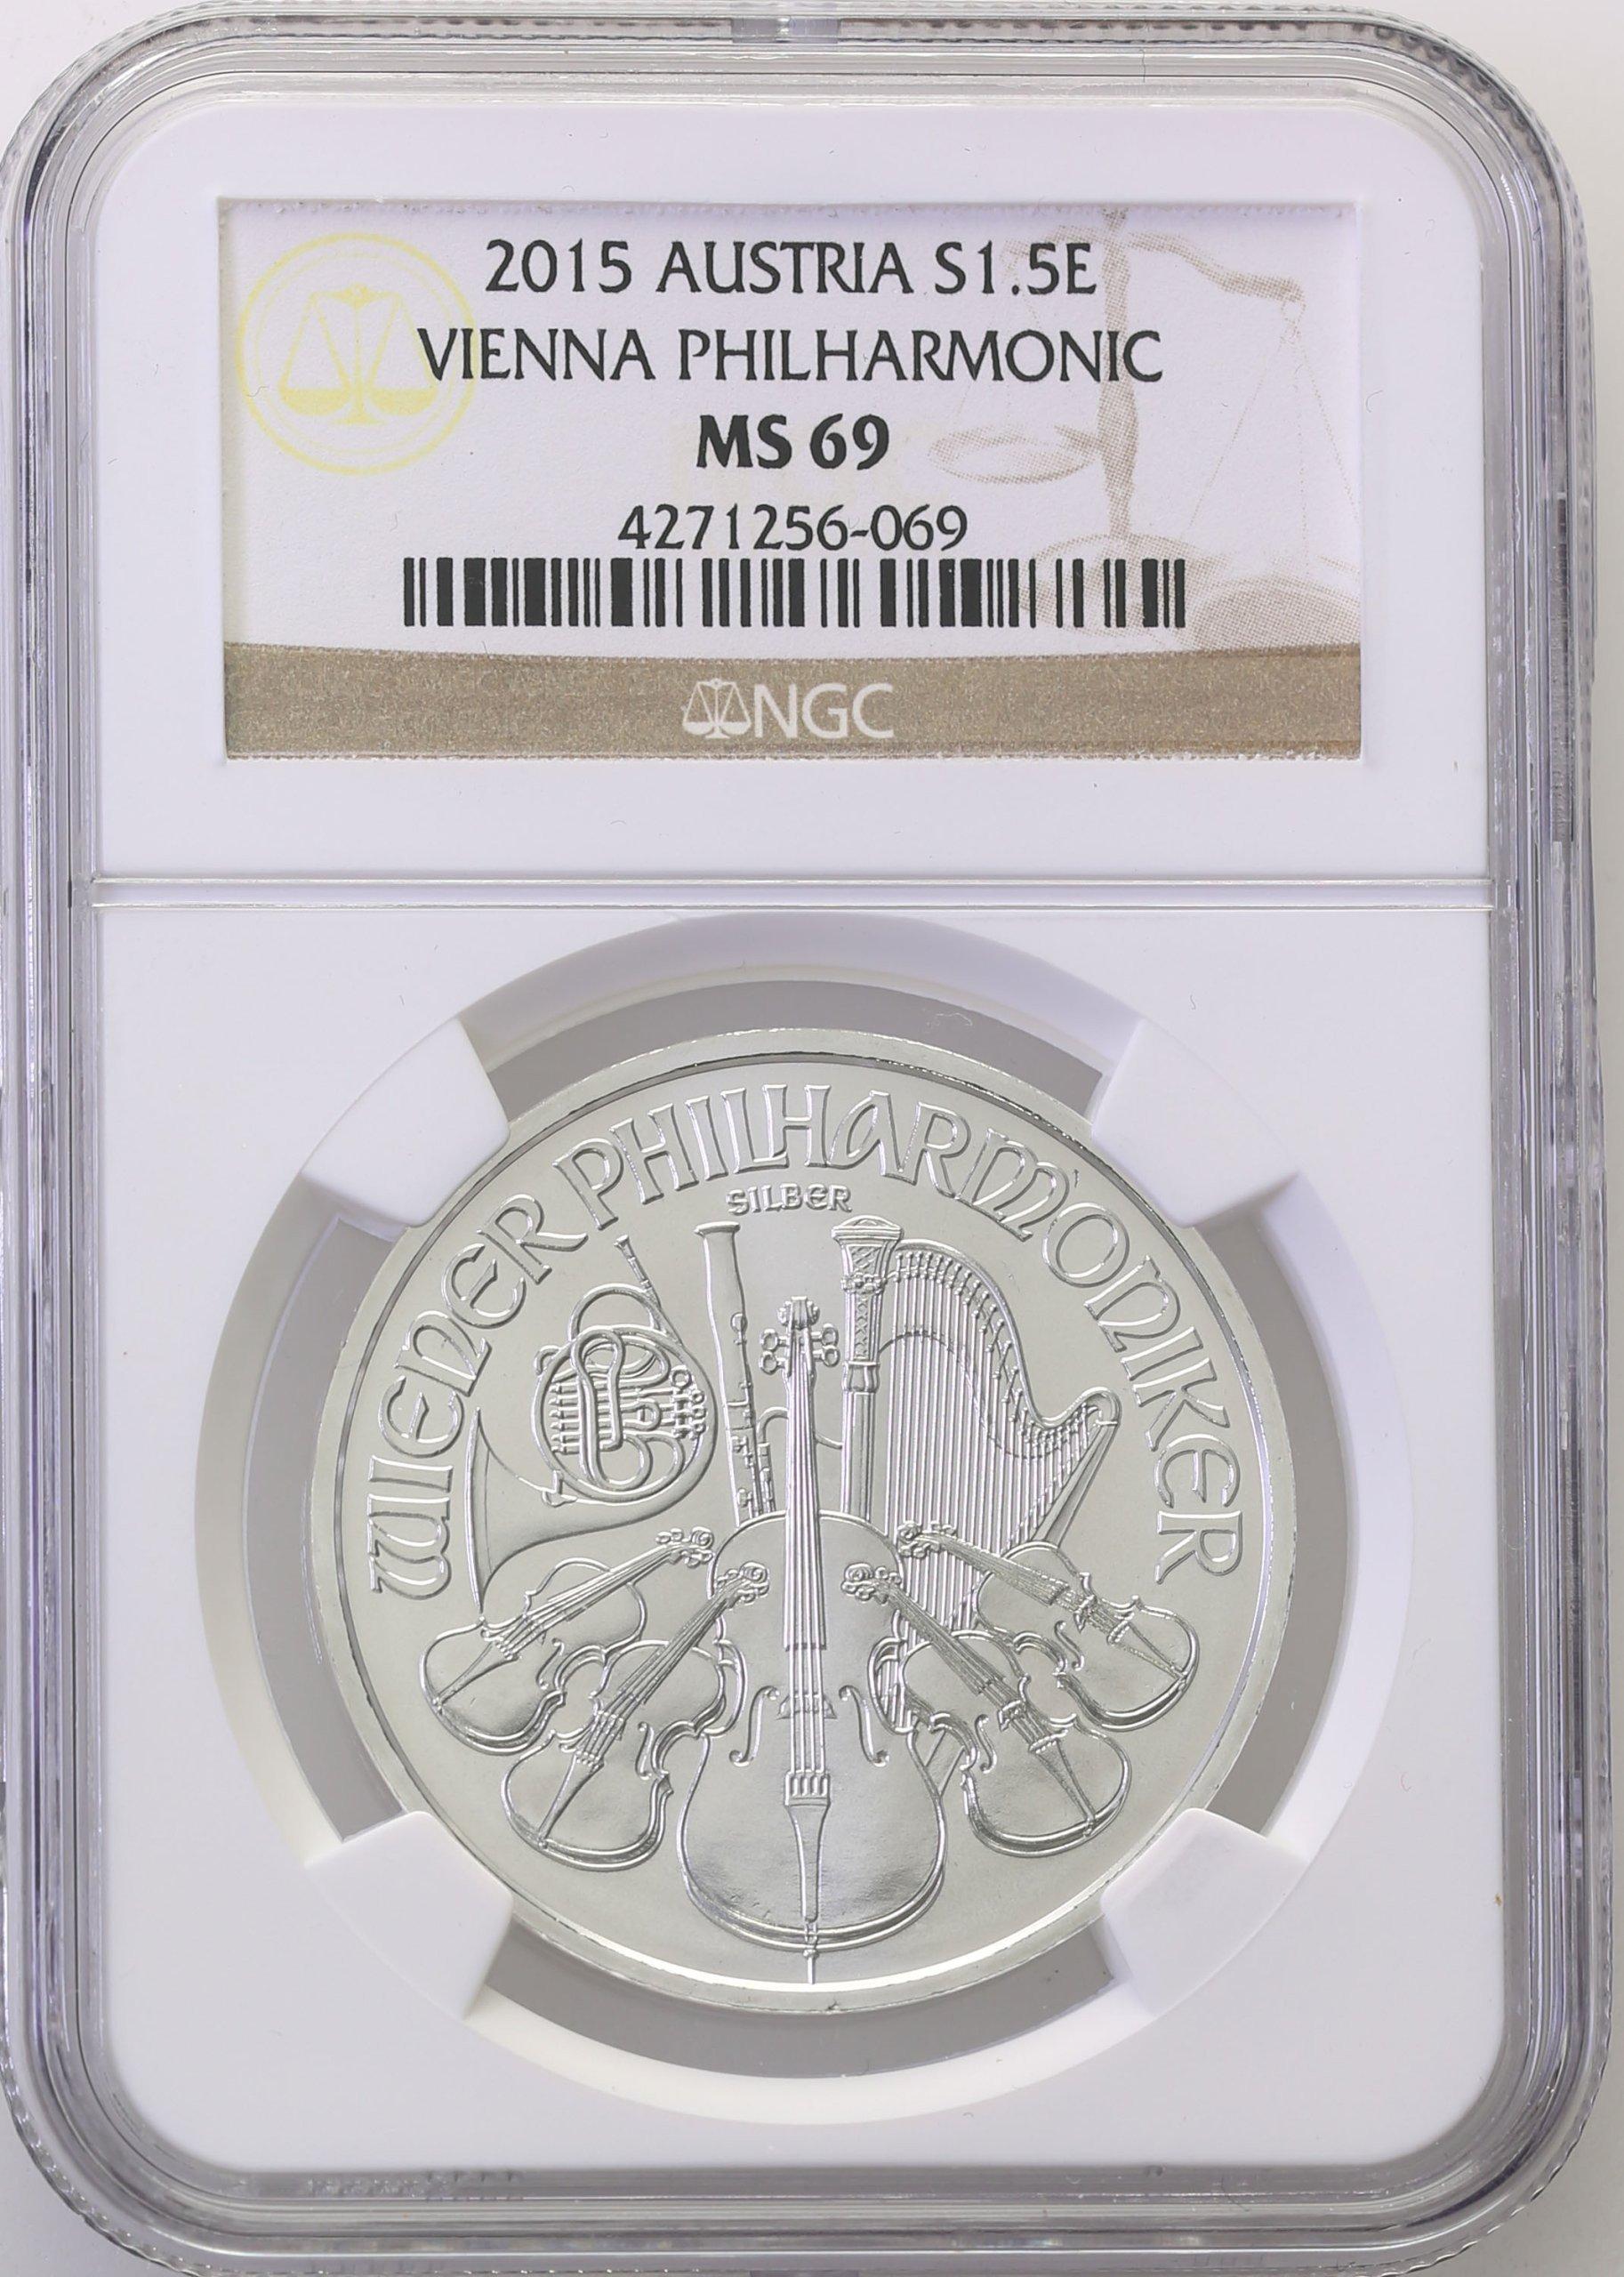 Austria 1,50 Euro 2015 Filharmonicy NGC MS69